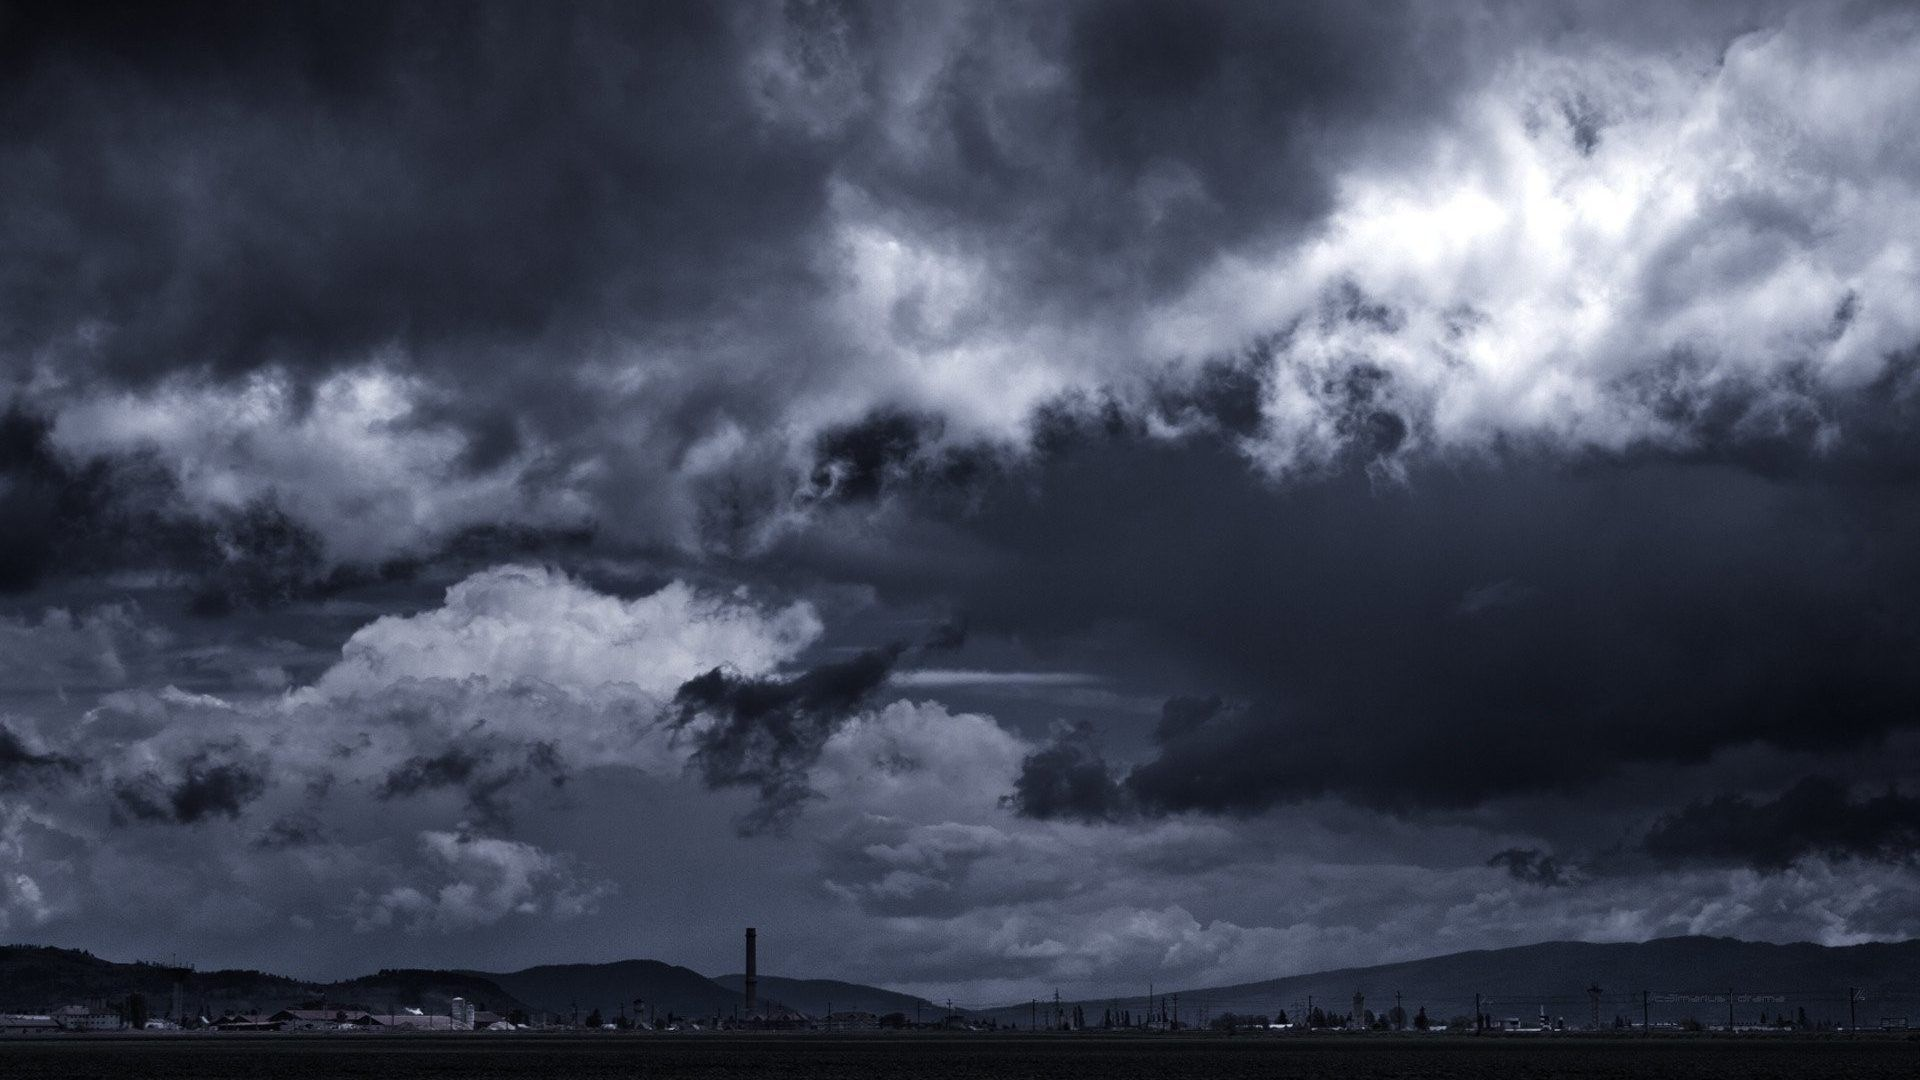 Sky Storm Nature Weather Rain Clouds Best Desktop Wallpapers 1920x1080 Clouds Cloud Wallpaper Desktop Wallpaper 1920x1080